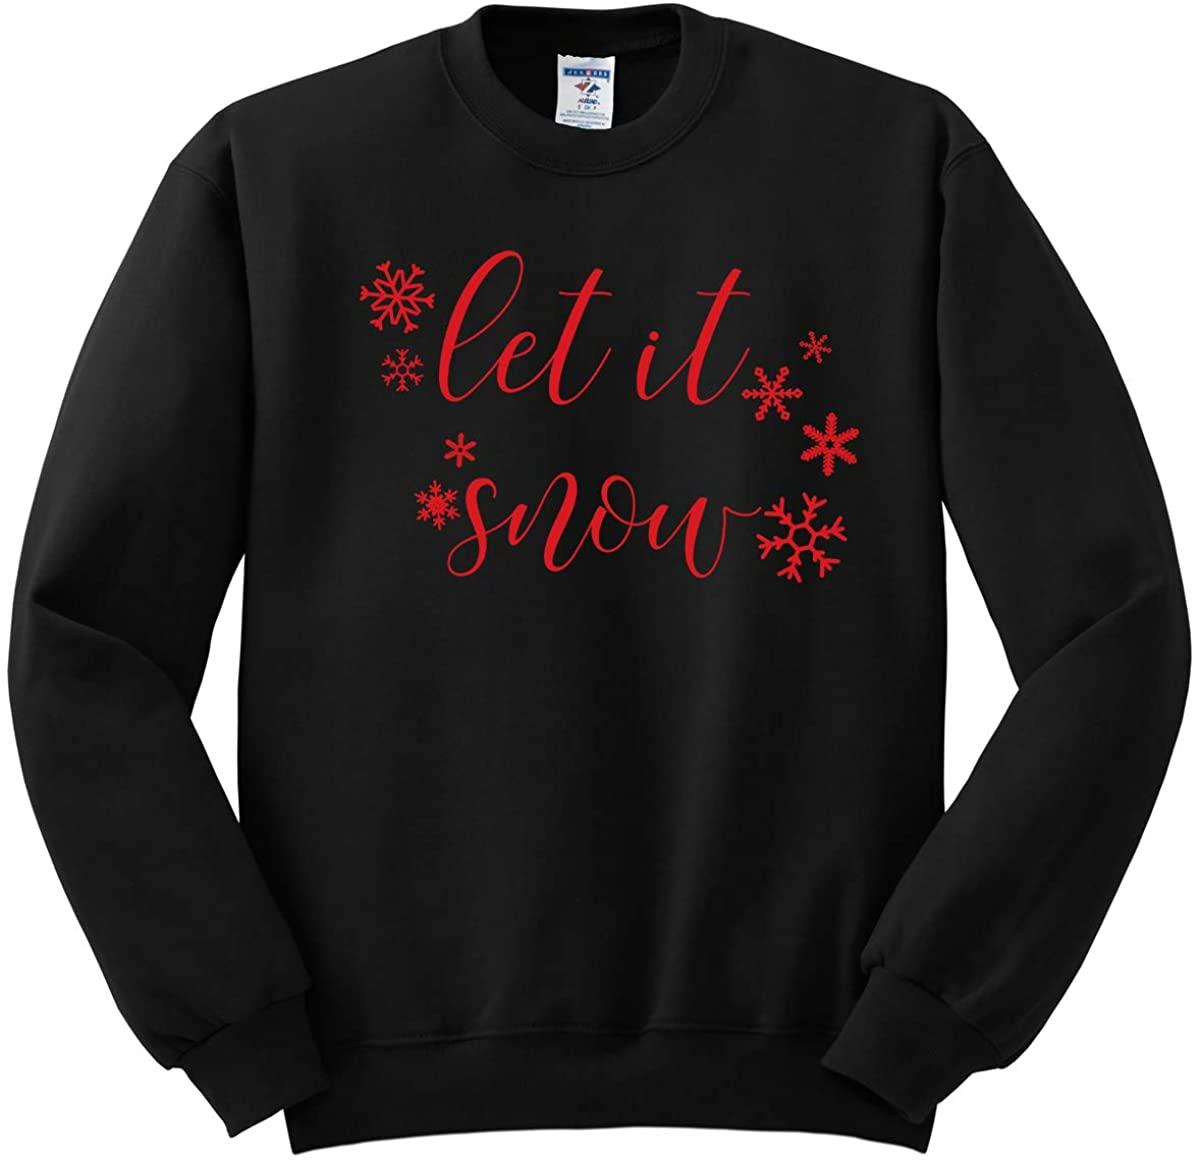 INK STITCH Unisex 562M Adults and Kids Christmas Let it Snow Crewneck Sweatshirts - Black (Kids XL)